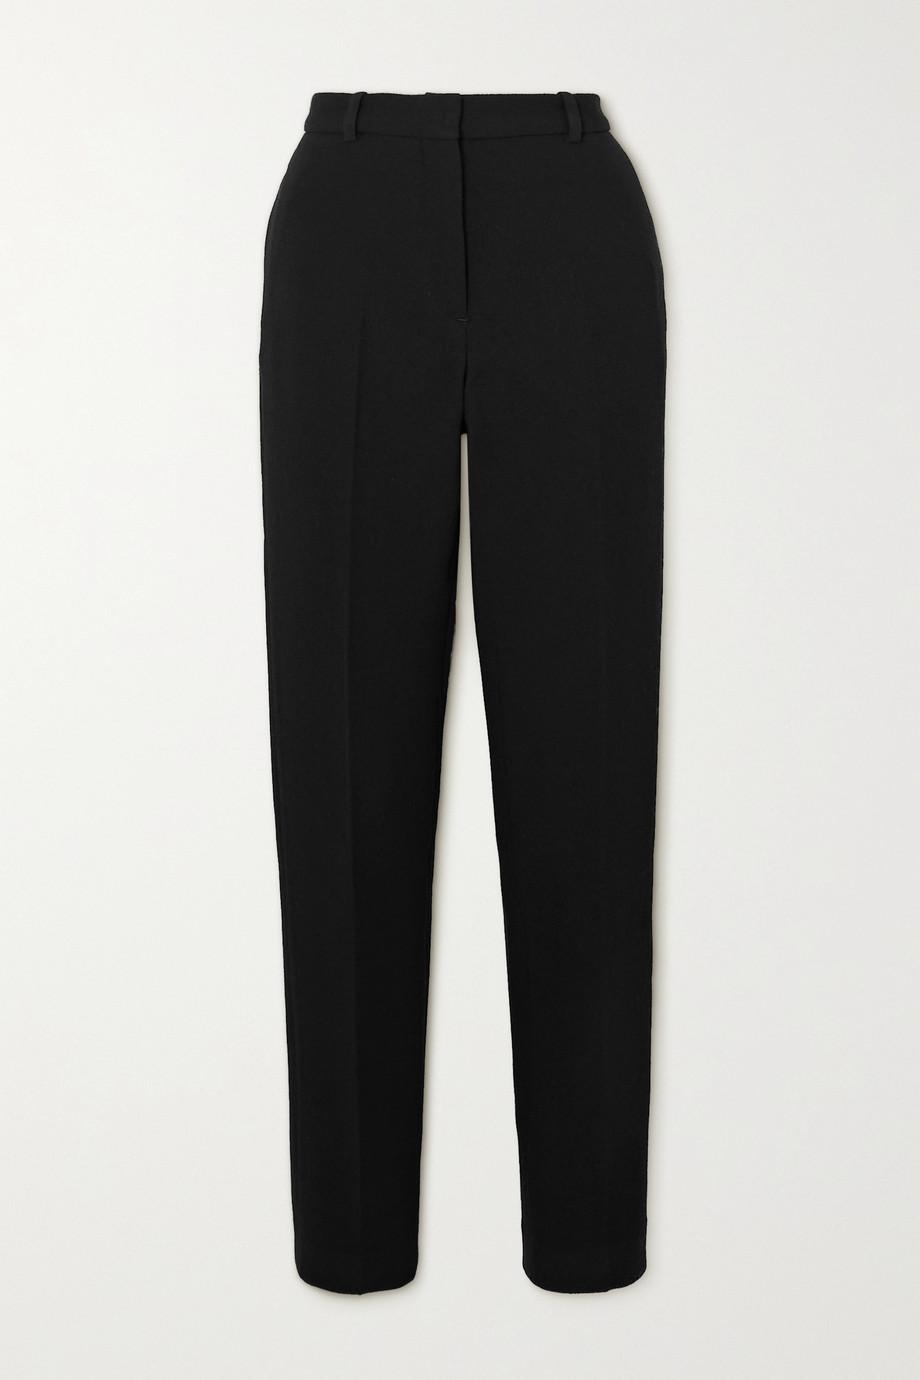 Rosetta Getty Wool-crepe tapered pants